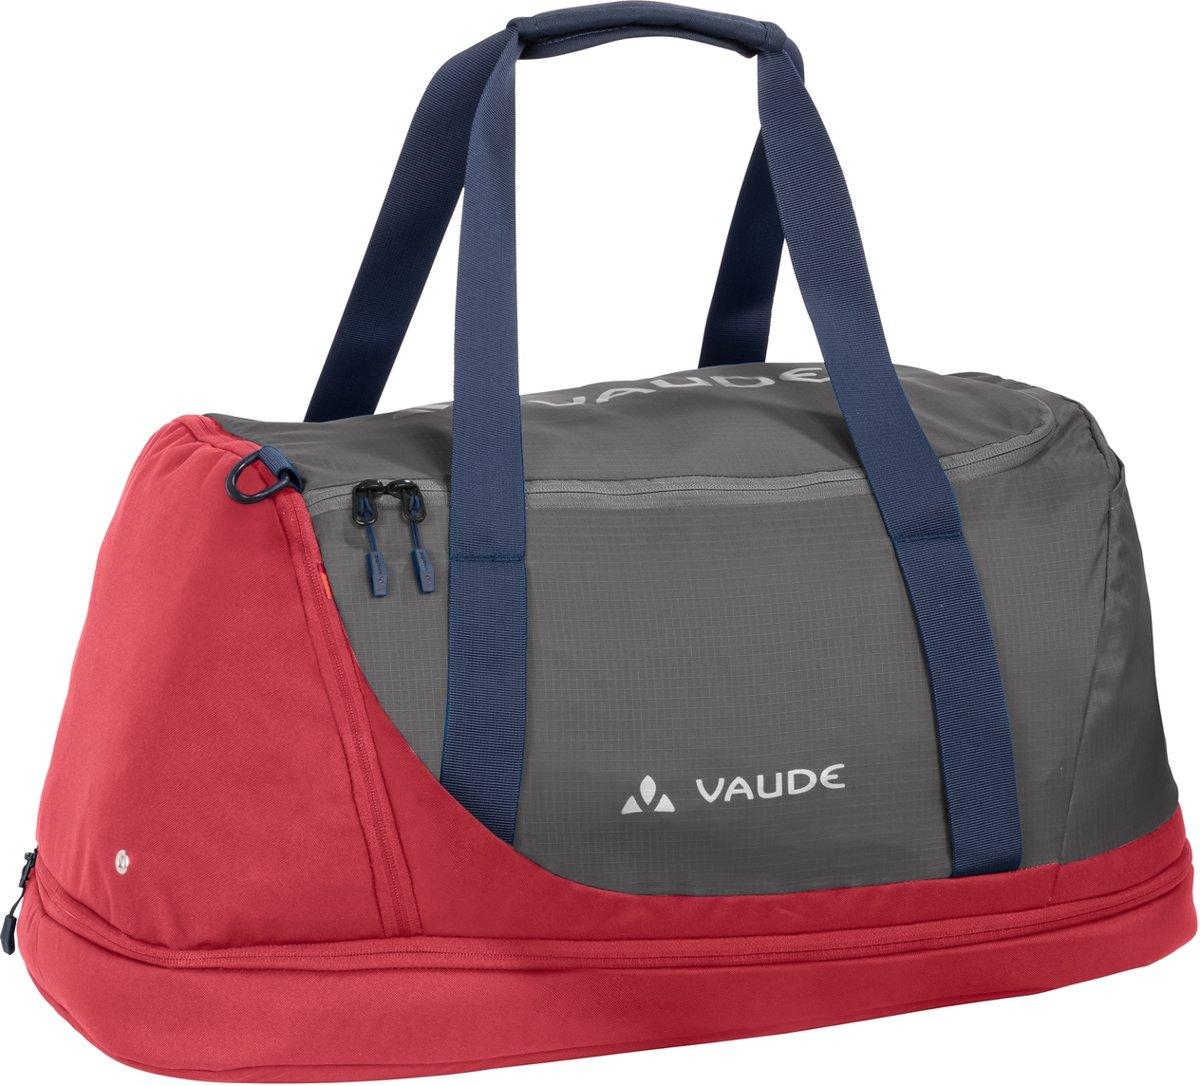 Vaude Tecotraining II 50+10 - City bag - strawberry kopen